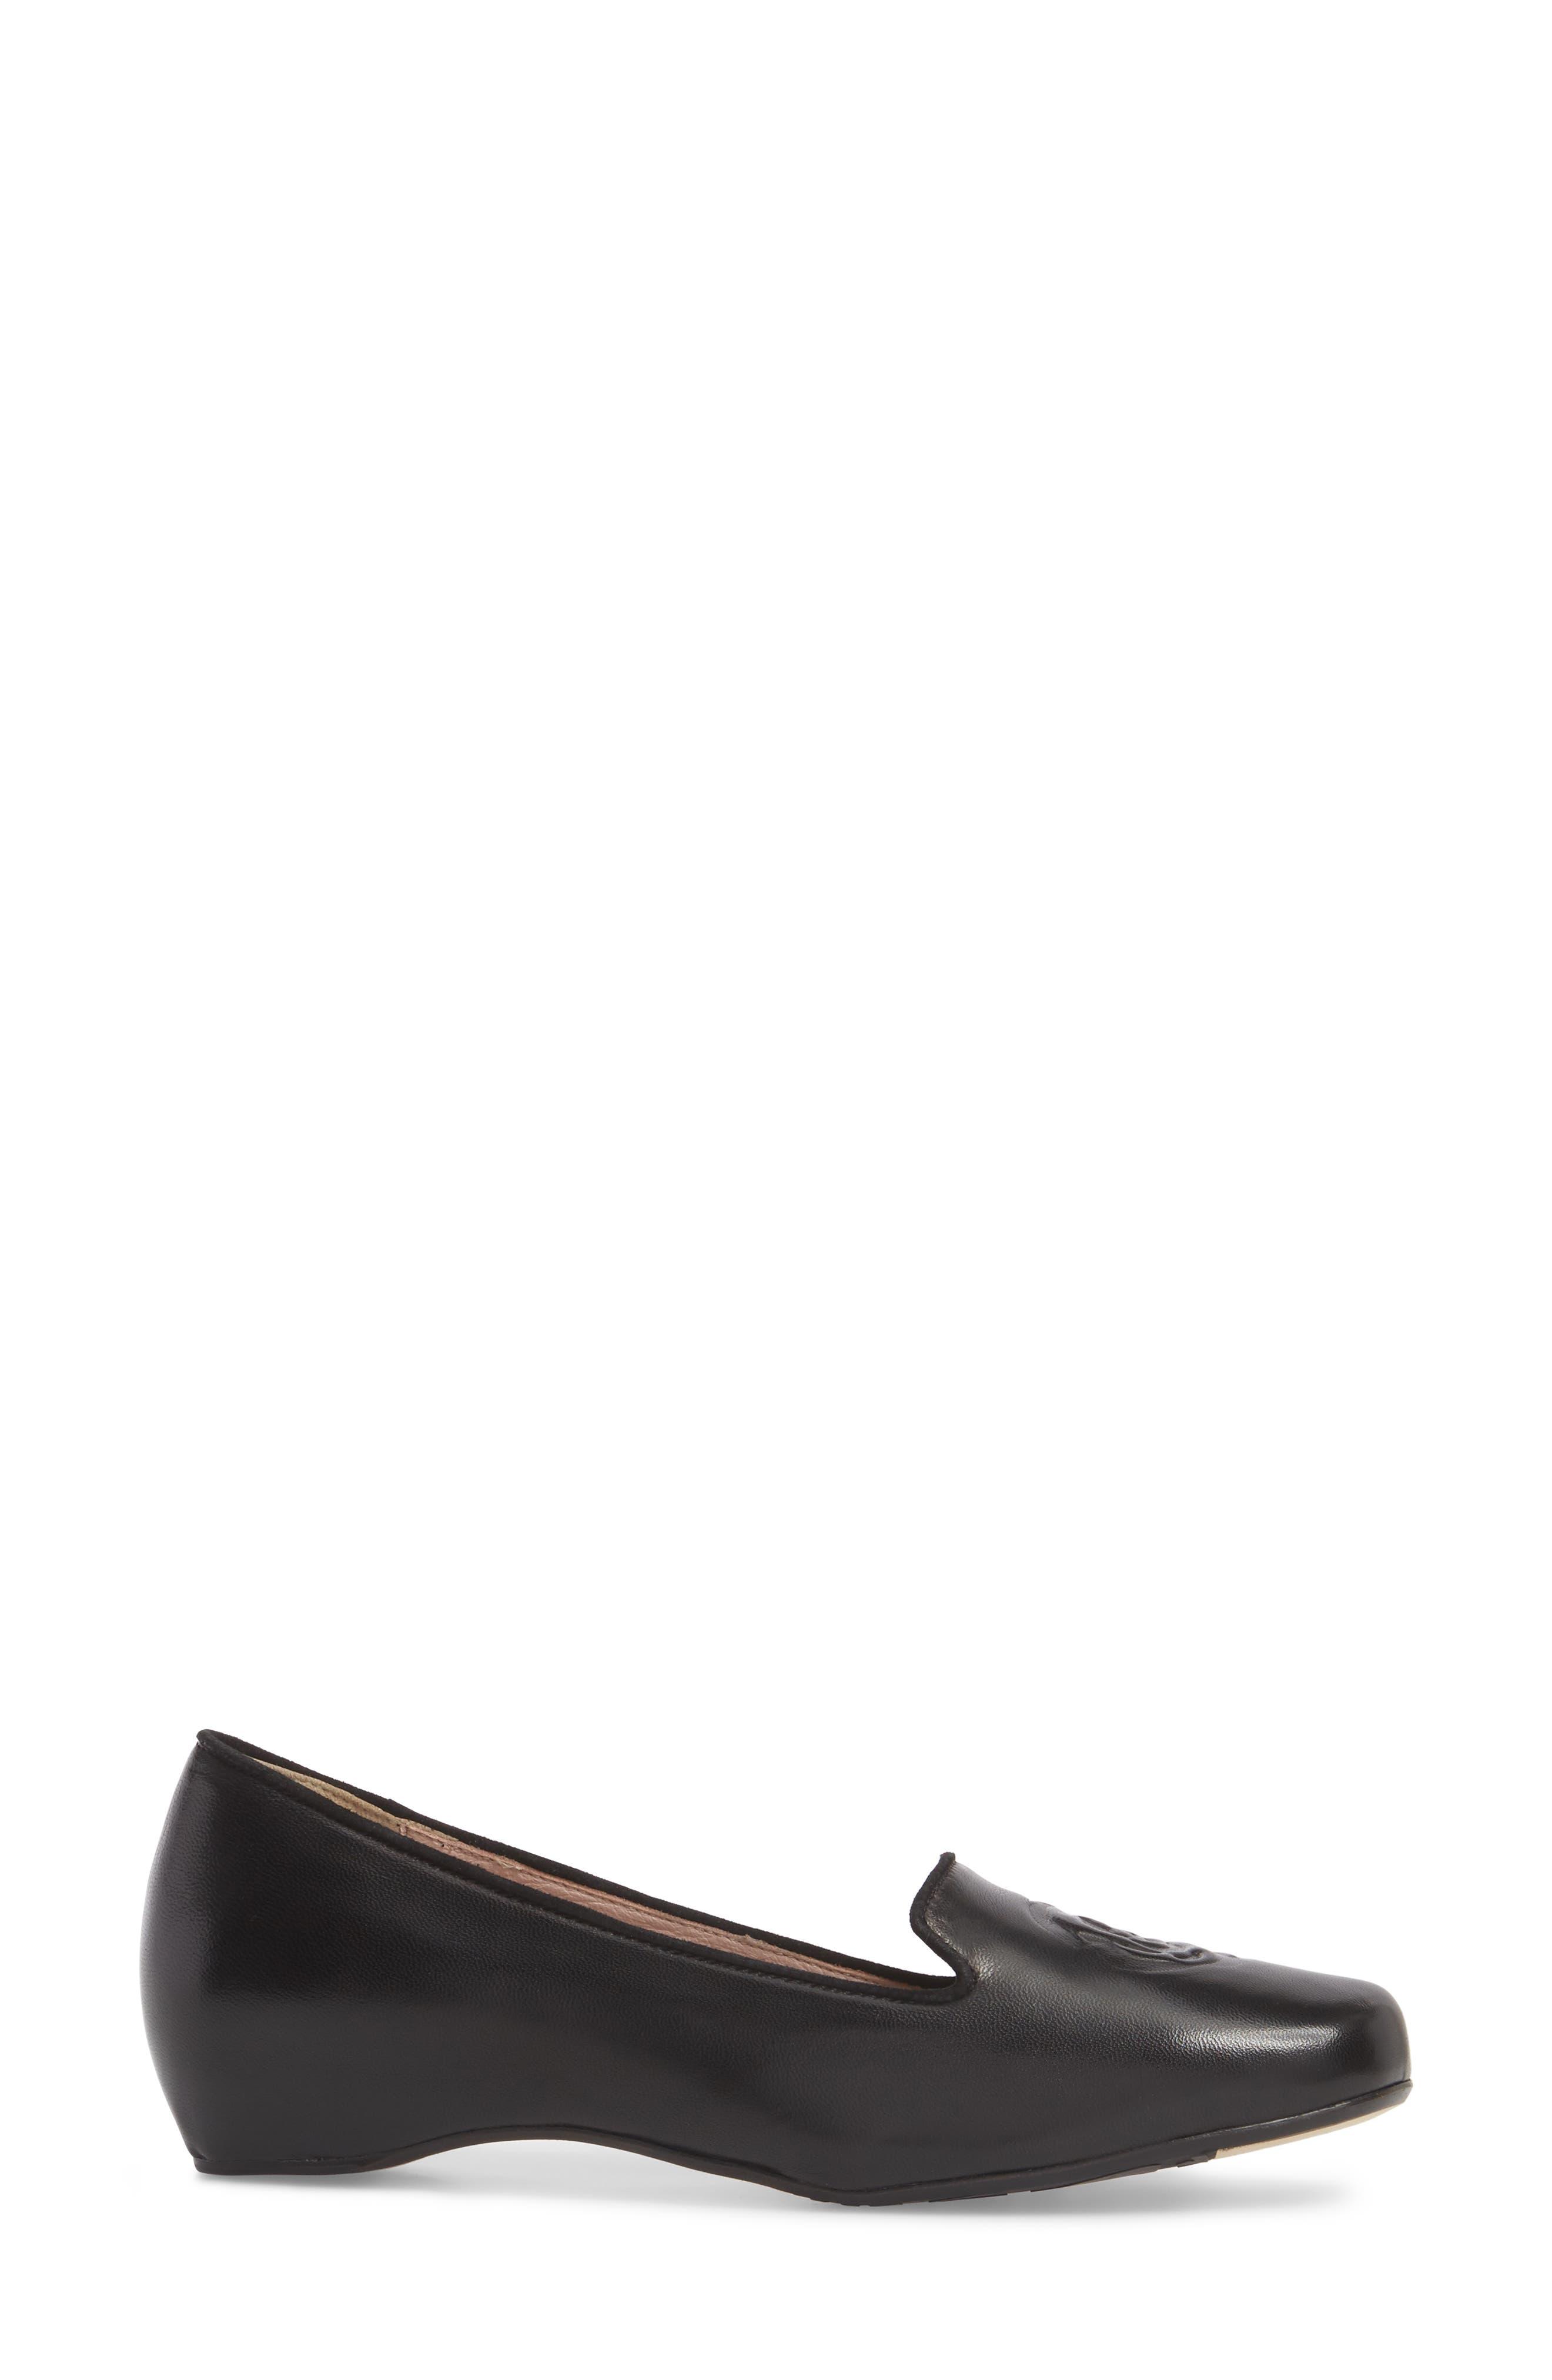 Taryn Rose Belissa Loafer,                             Alternate thumbnail 3, color,                             Black Leather